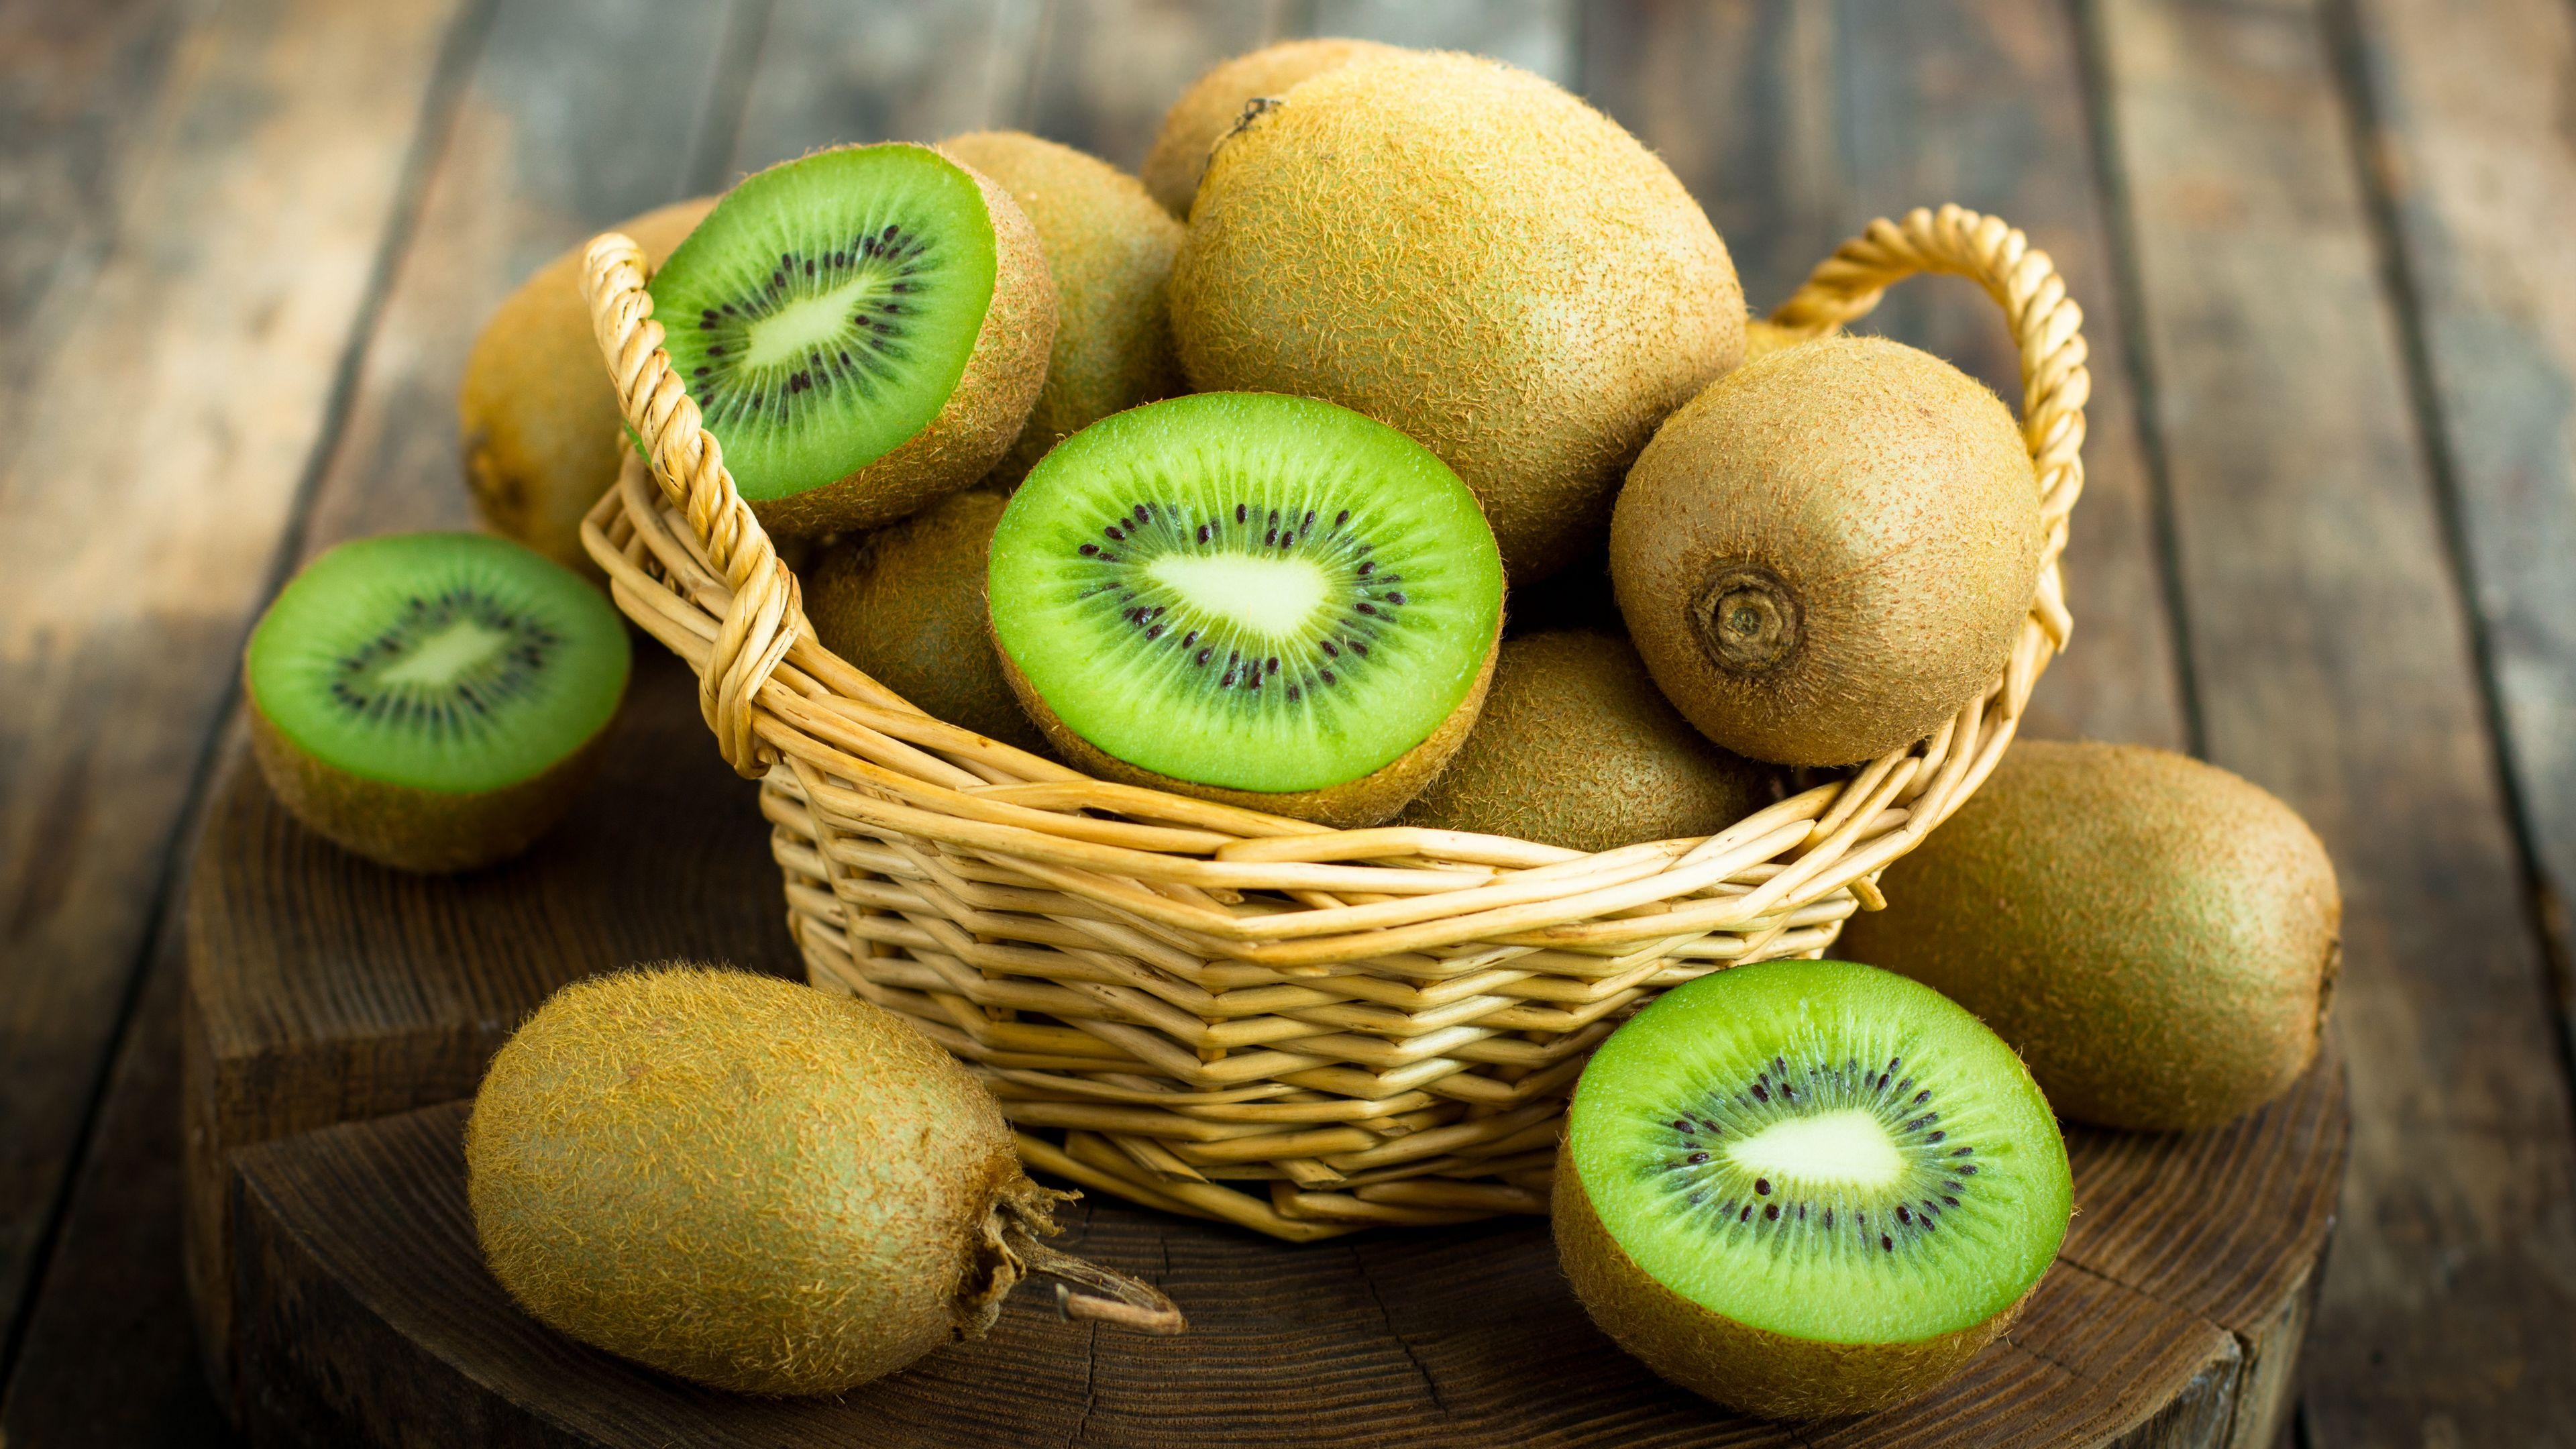 PunjabKesari, Kiwi Benefits